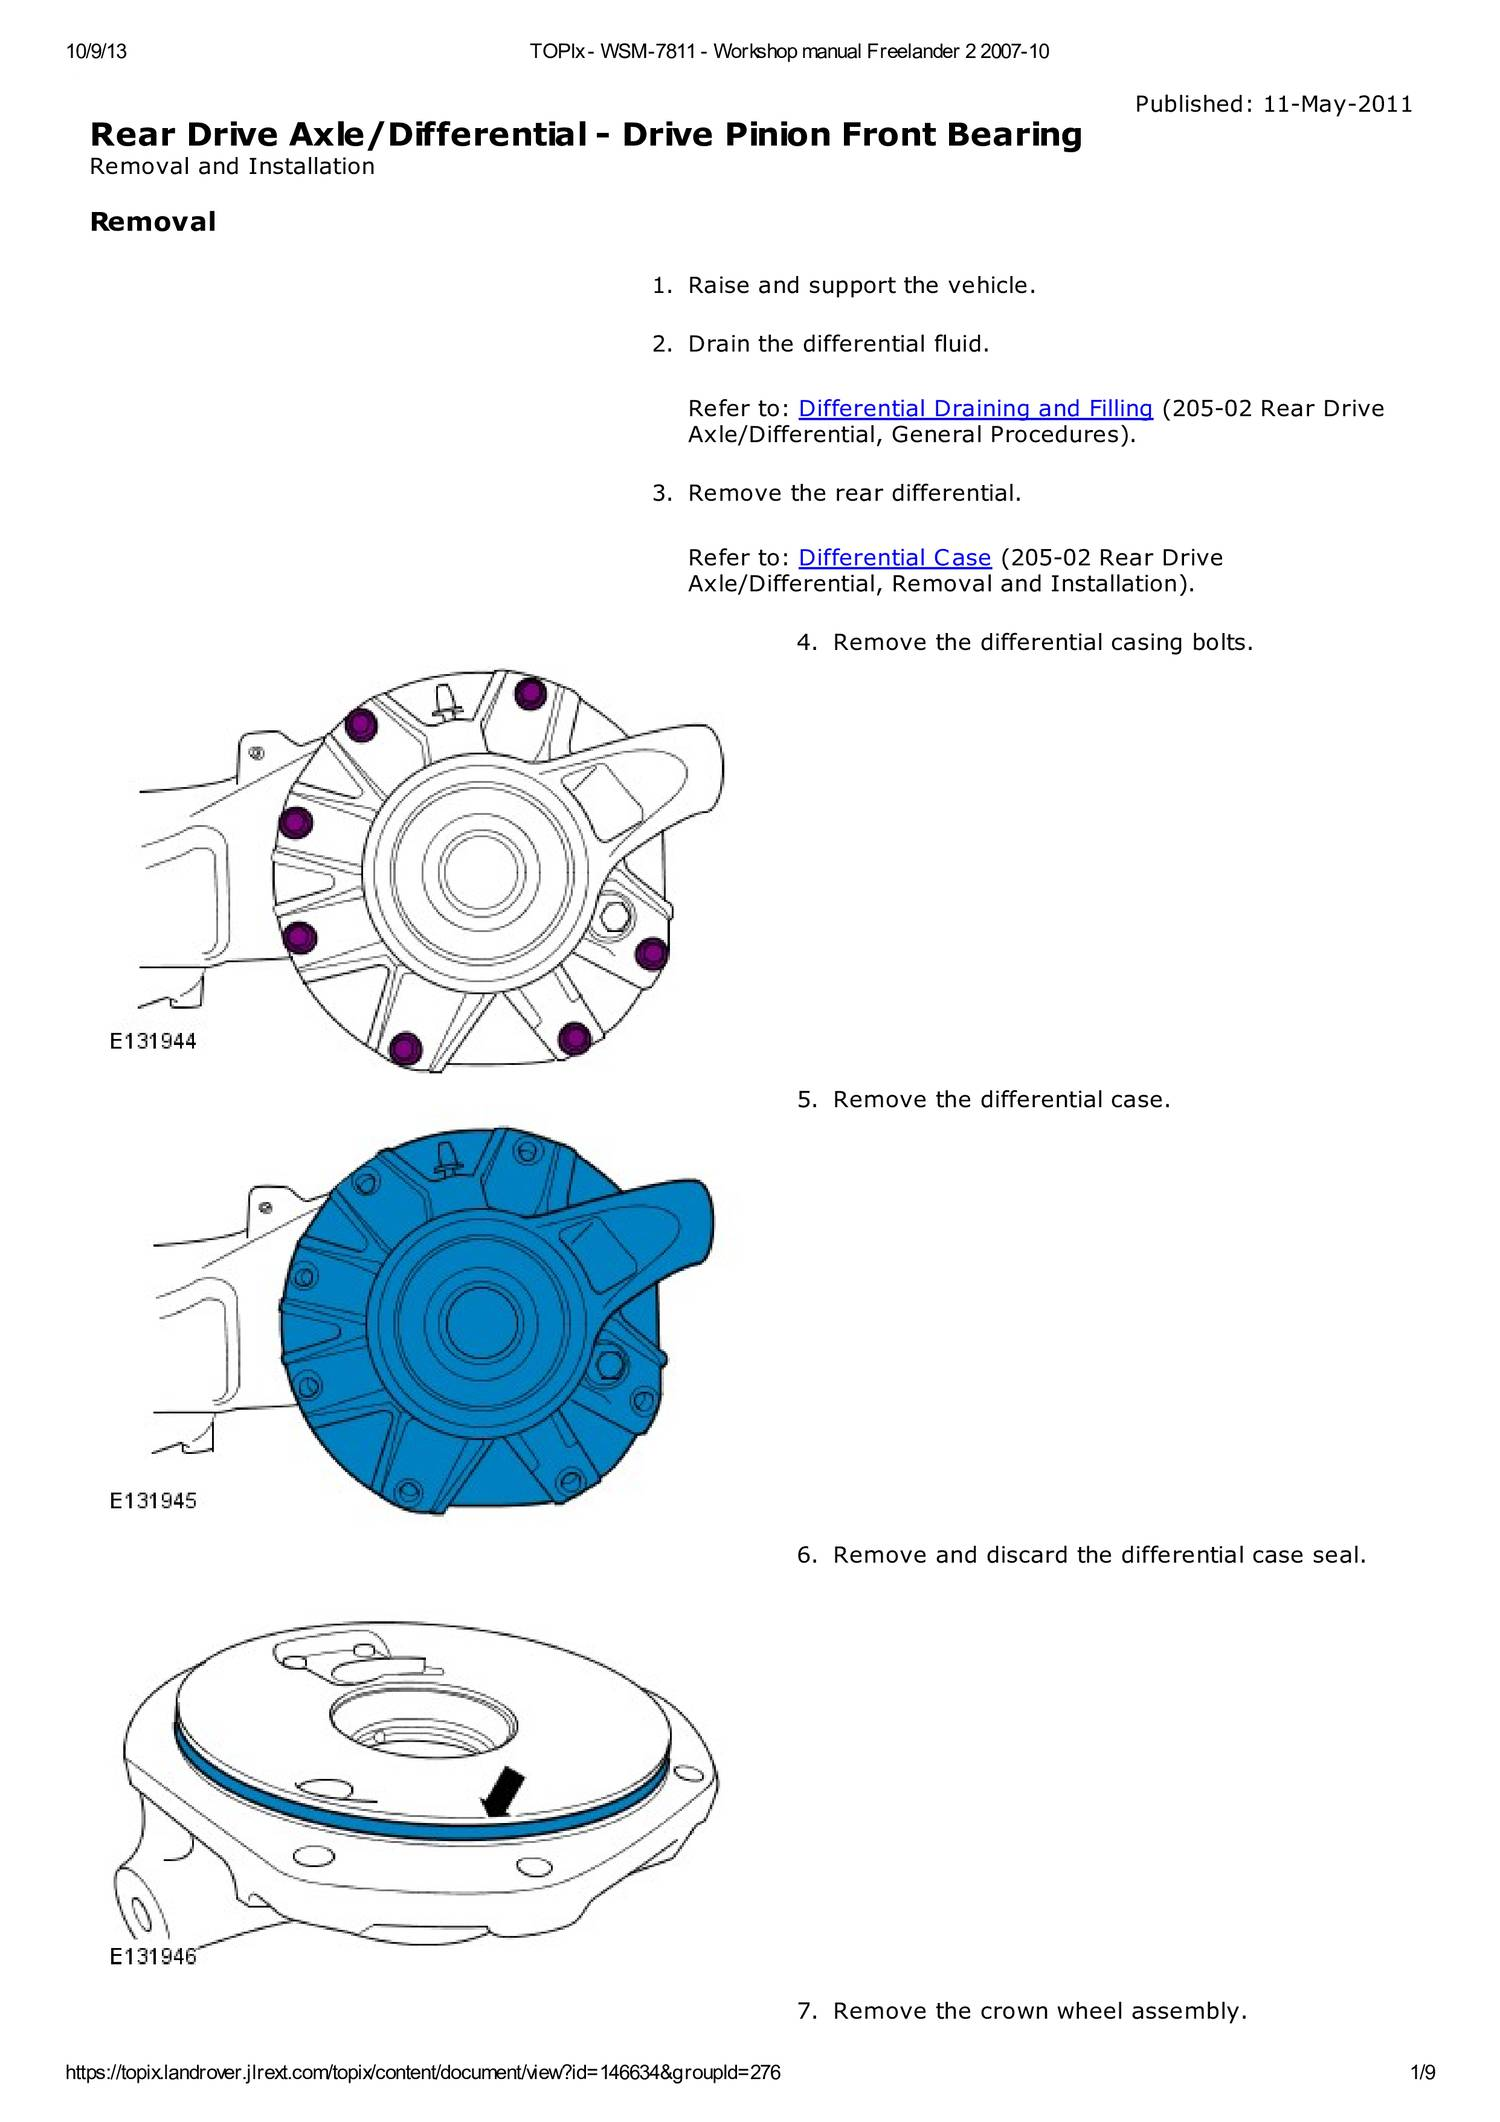 Freelander Manual Auto Electrical Wiring Diagram 2000 Jaguar S Type Stereo Topix Wsm 7811